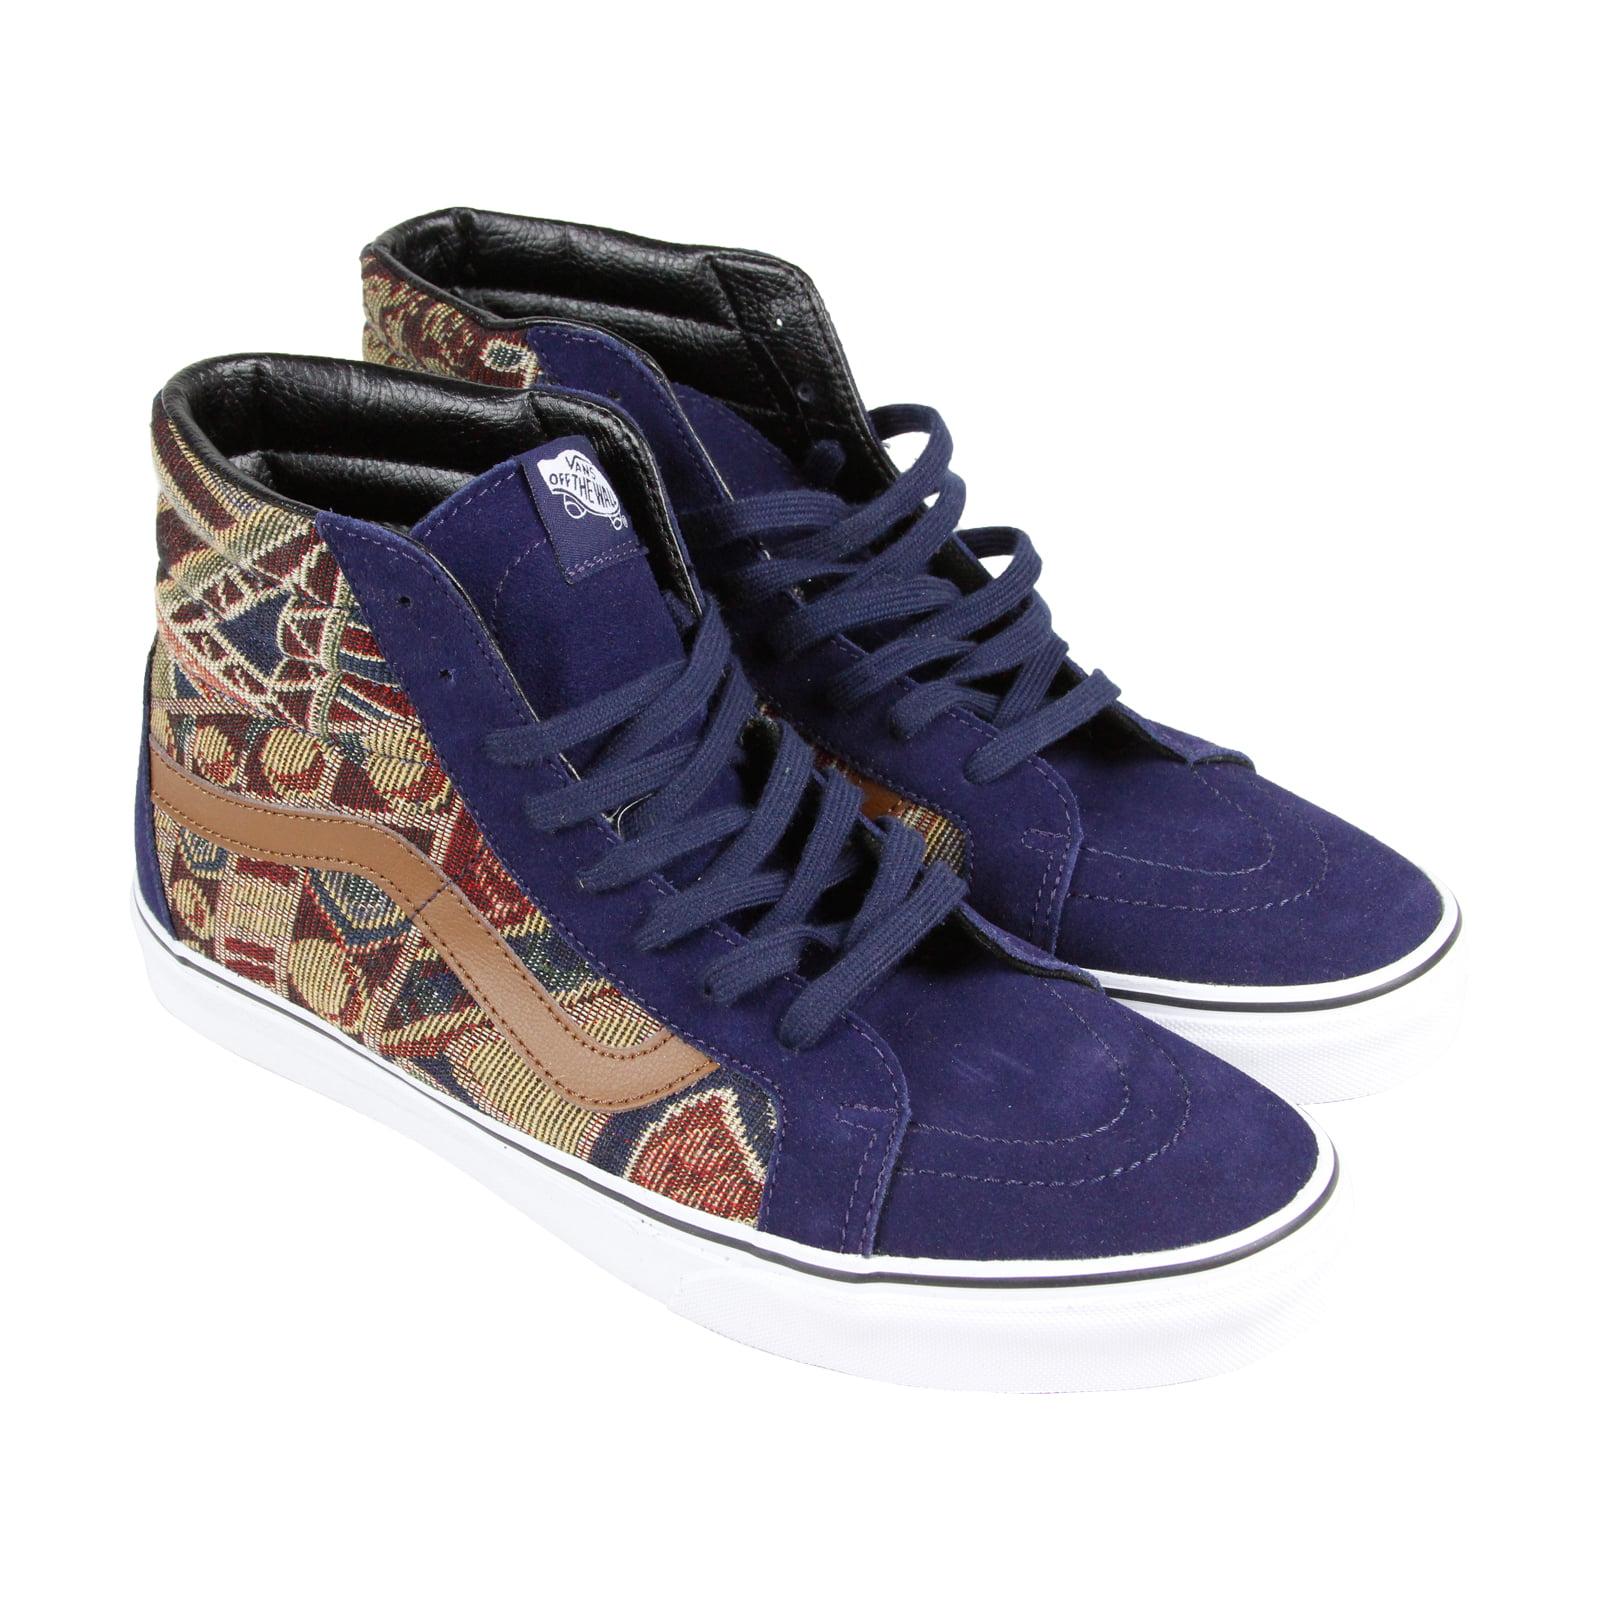 Vans Sk8 Hi Reissue Mens Purple Suede & Canvas High Top Lace Up Sneakers Shoes